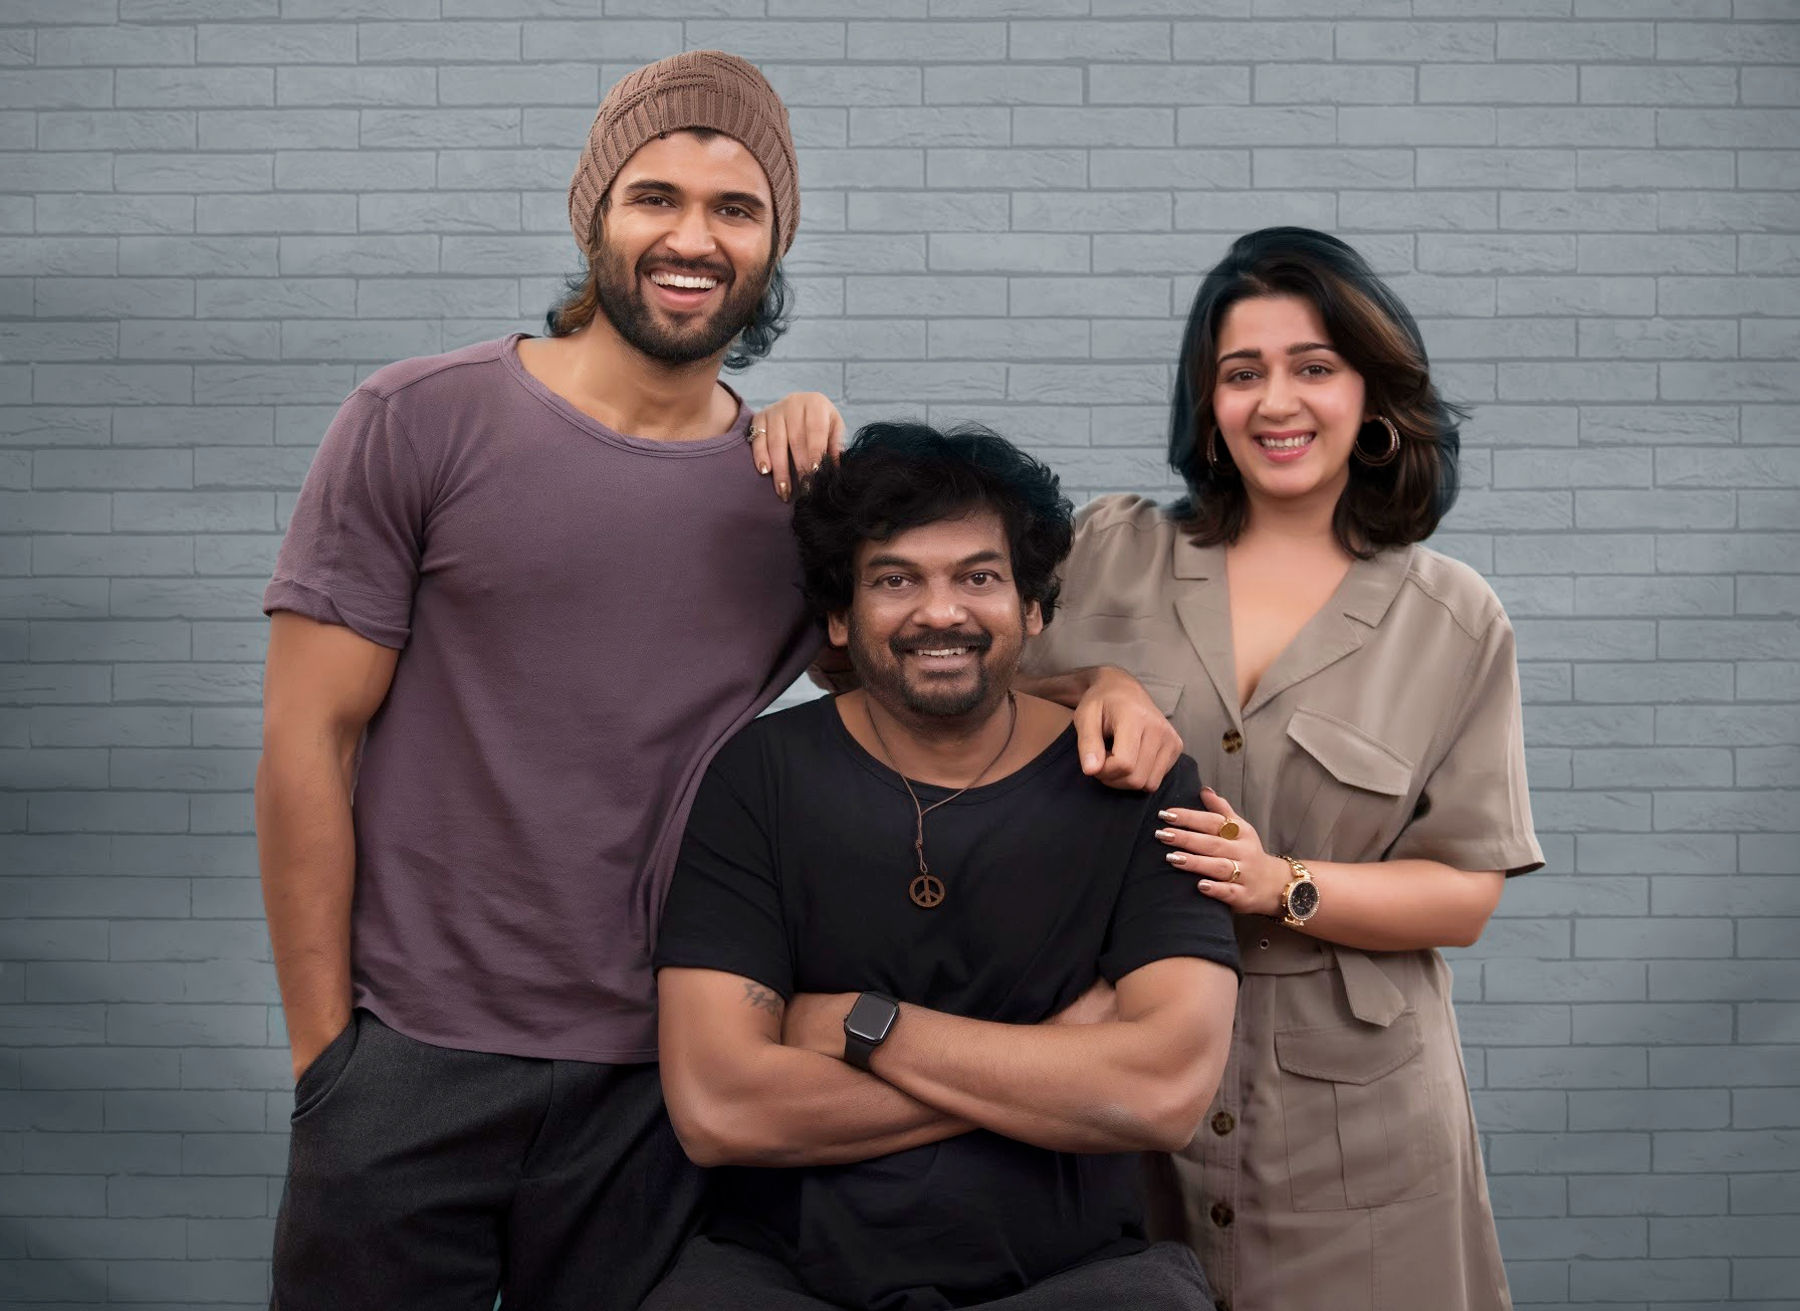 Vijay Deverakonda, Puri Jagannadh, Charmy Kaur Film Completes 40 Days Of Shoot